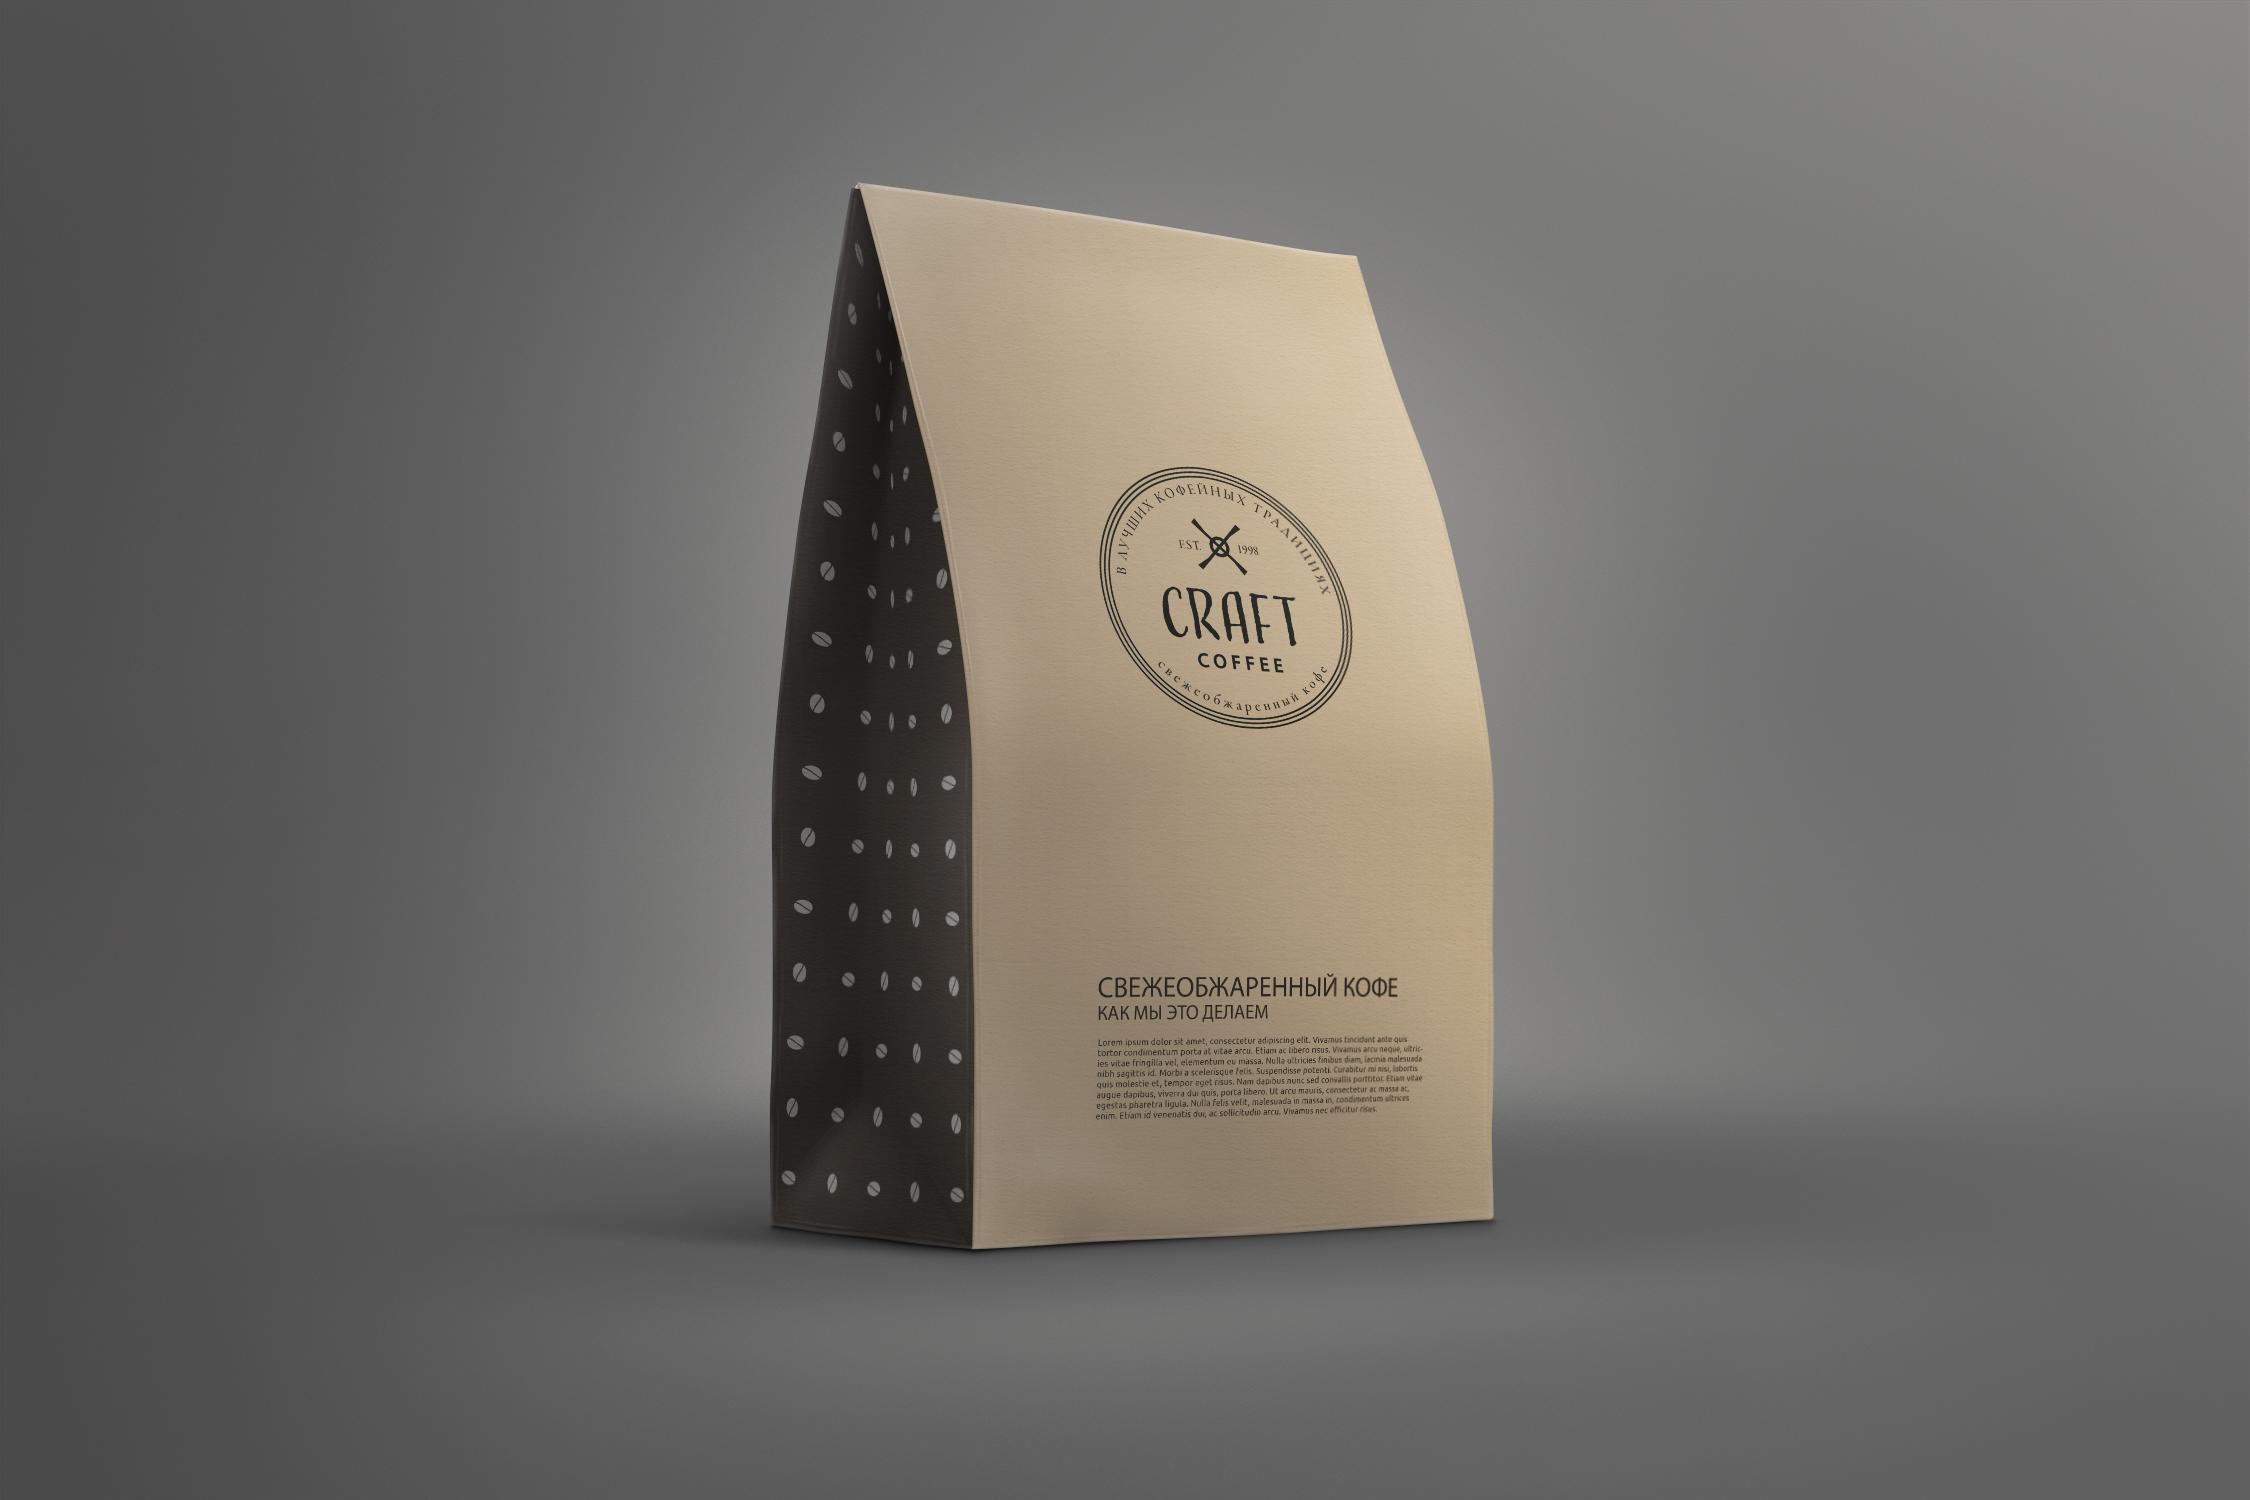 Логотип и фирменный стиль для компании COFFEE CULT фото f_9005bc48d21d179a.jpg